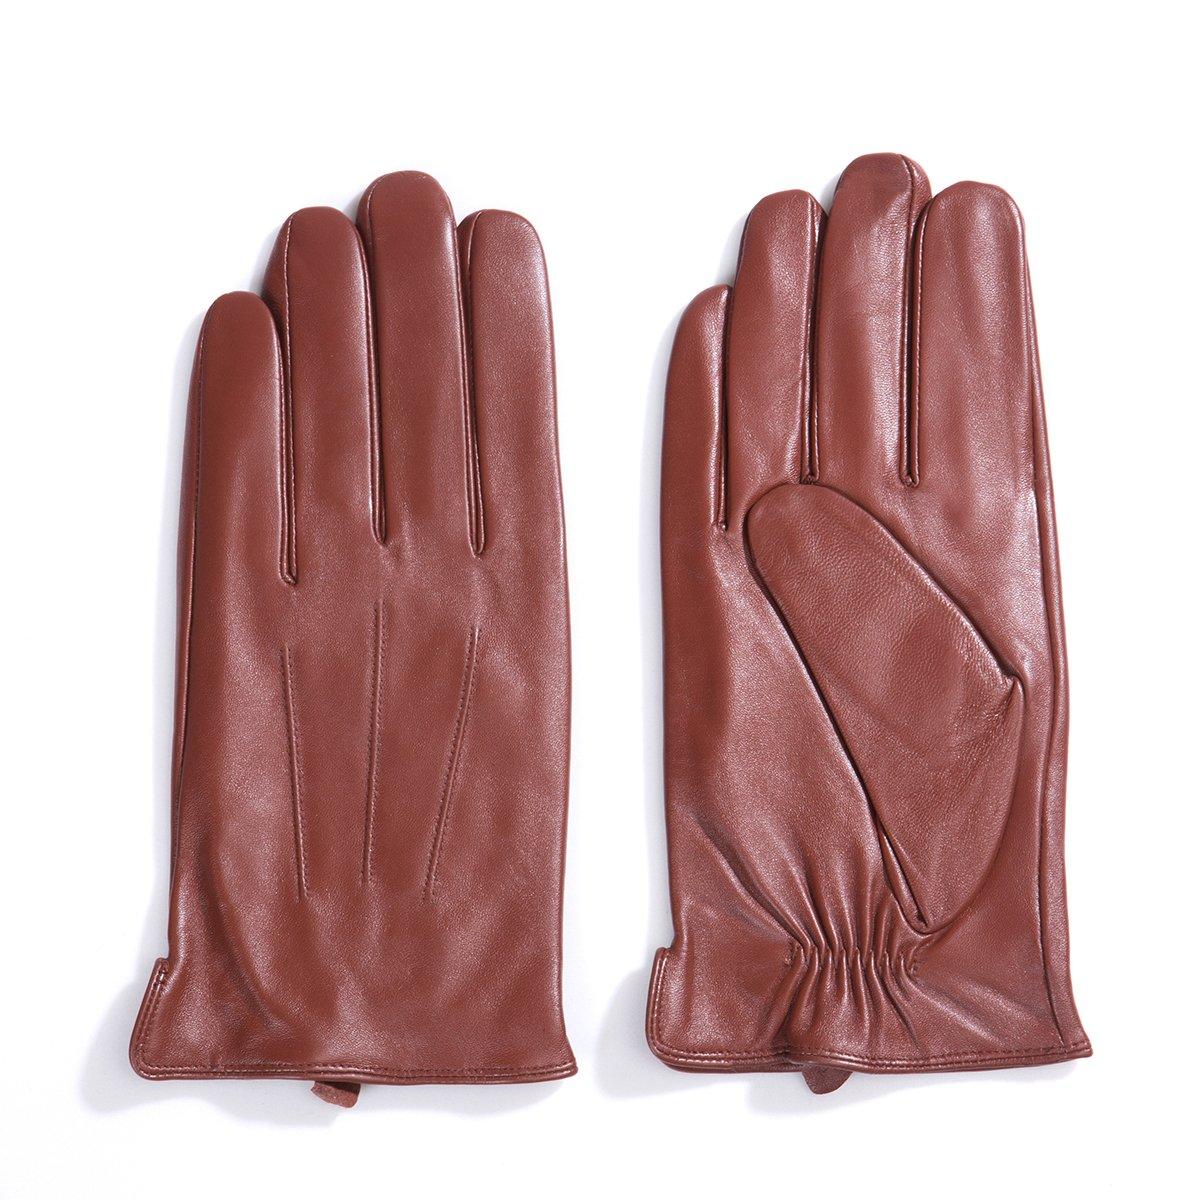 Cashmere//Long Fleece Lining MATSU Men Winter Warm Touchscreen Texting Lambskin Driving Motorcycle Leather Gloves M1006